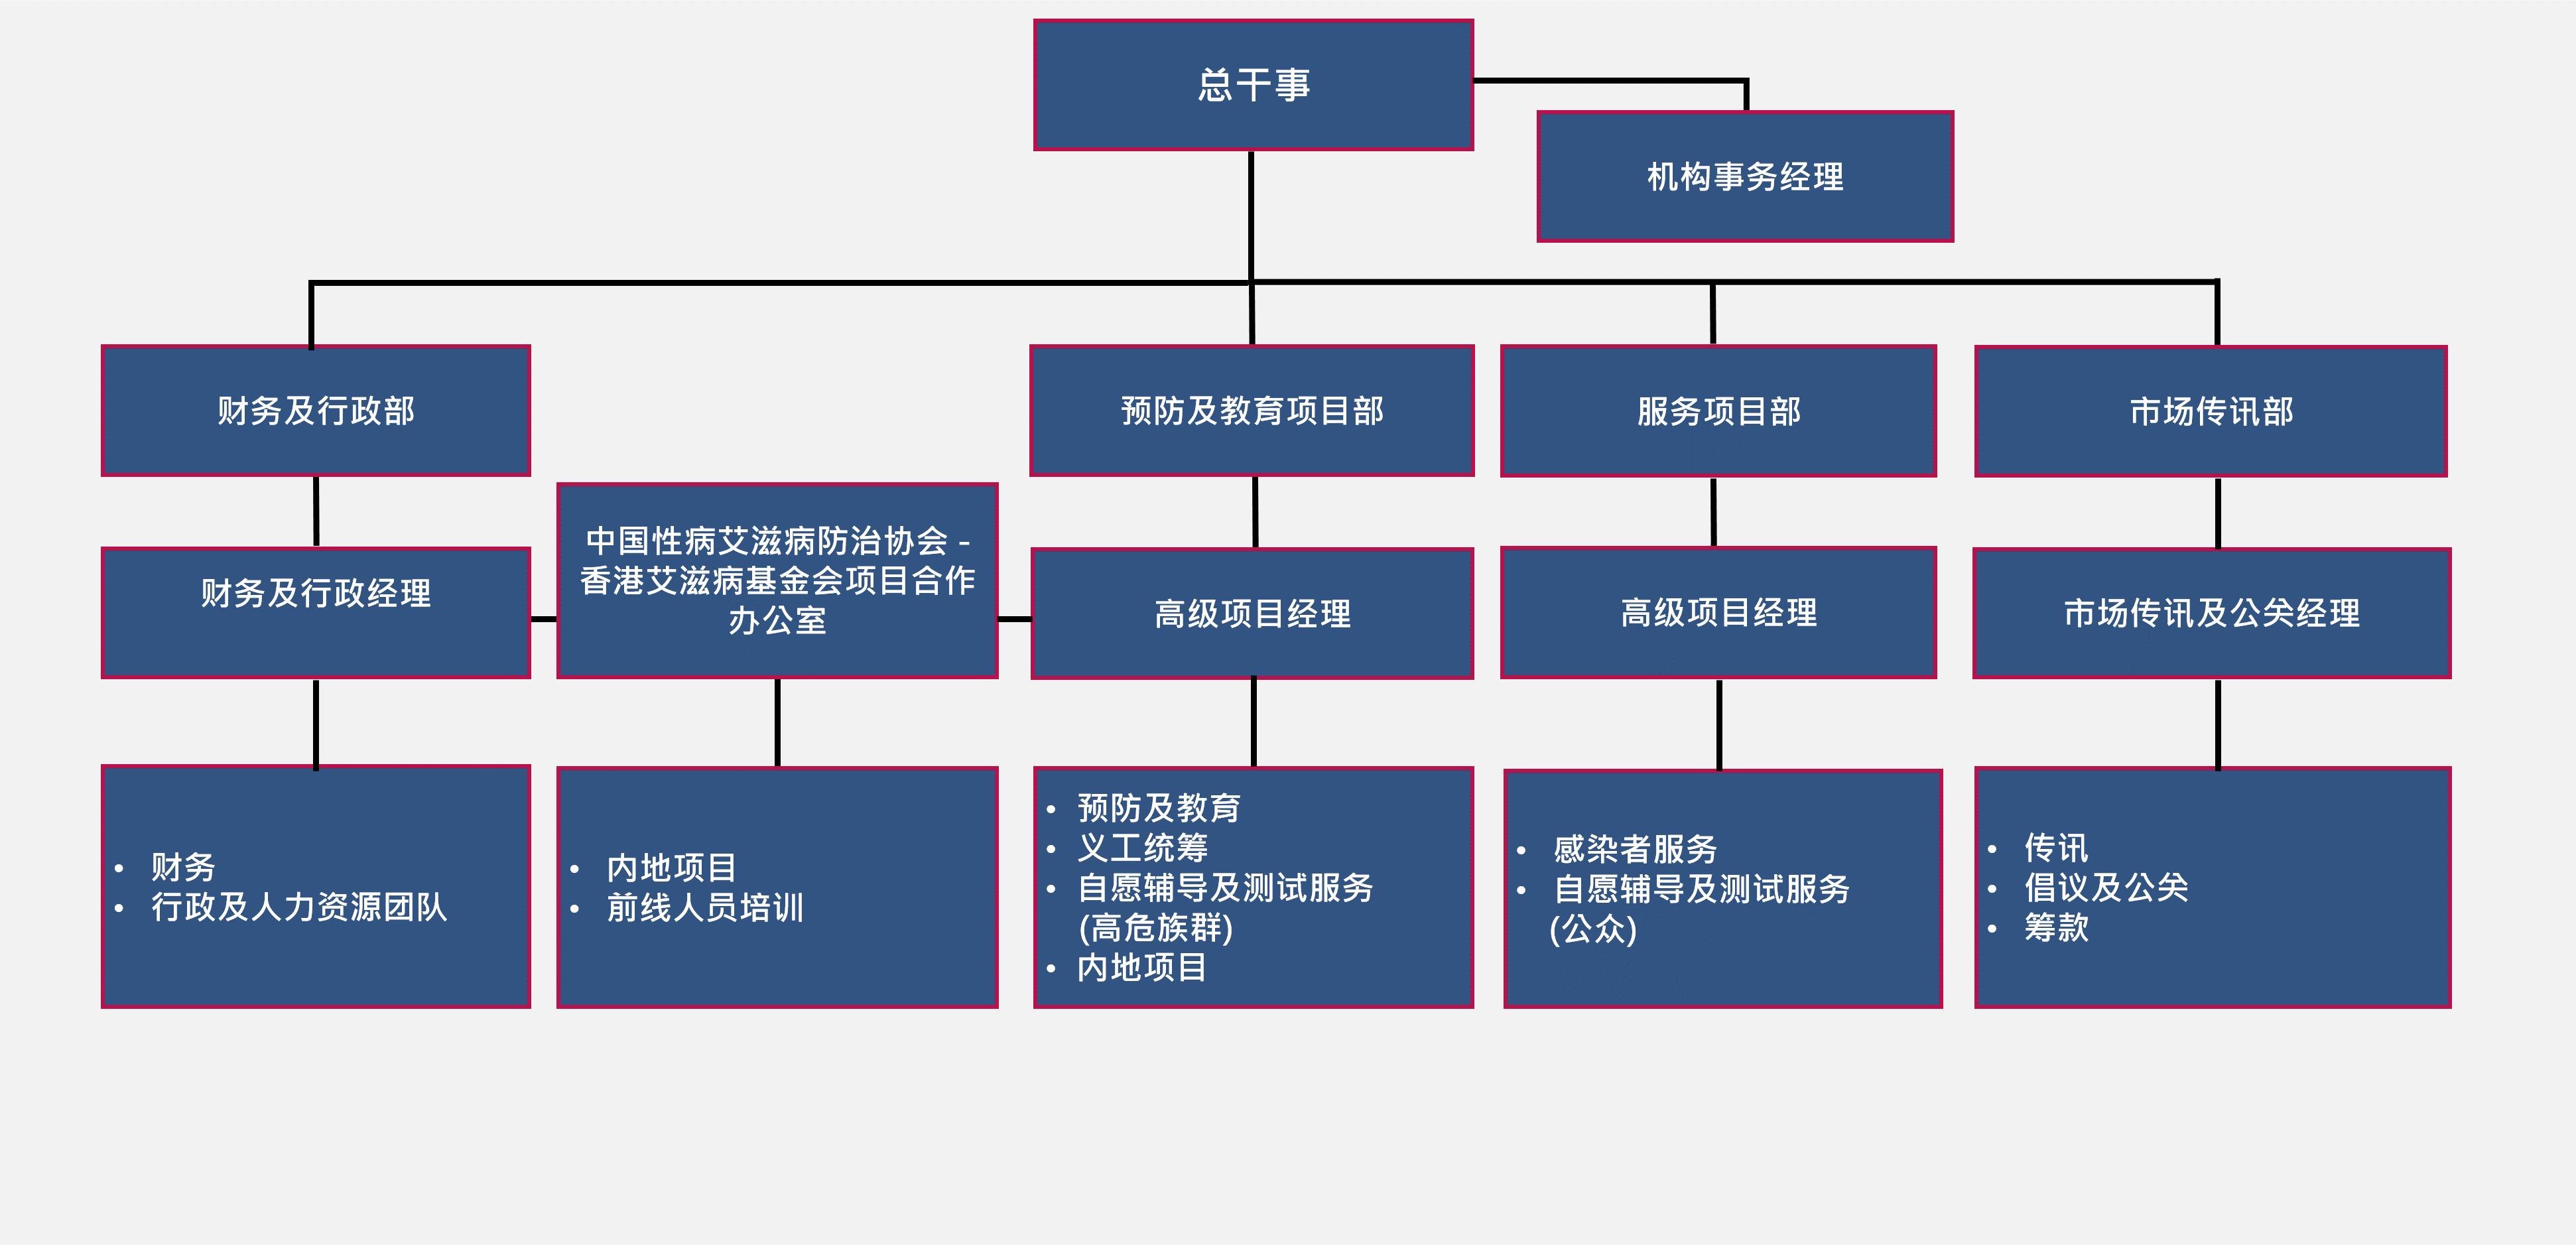 HKAF_Structure_sec_2018_sc